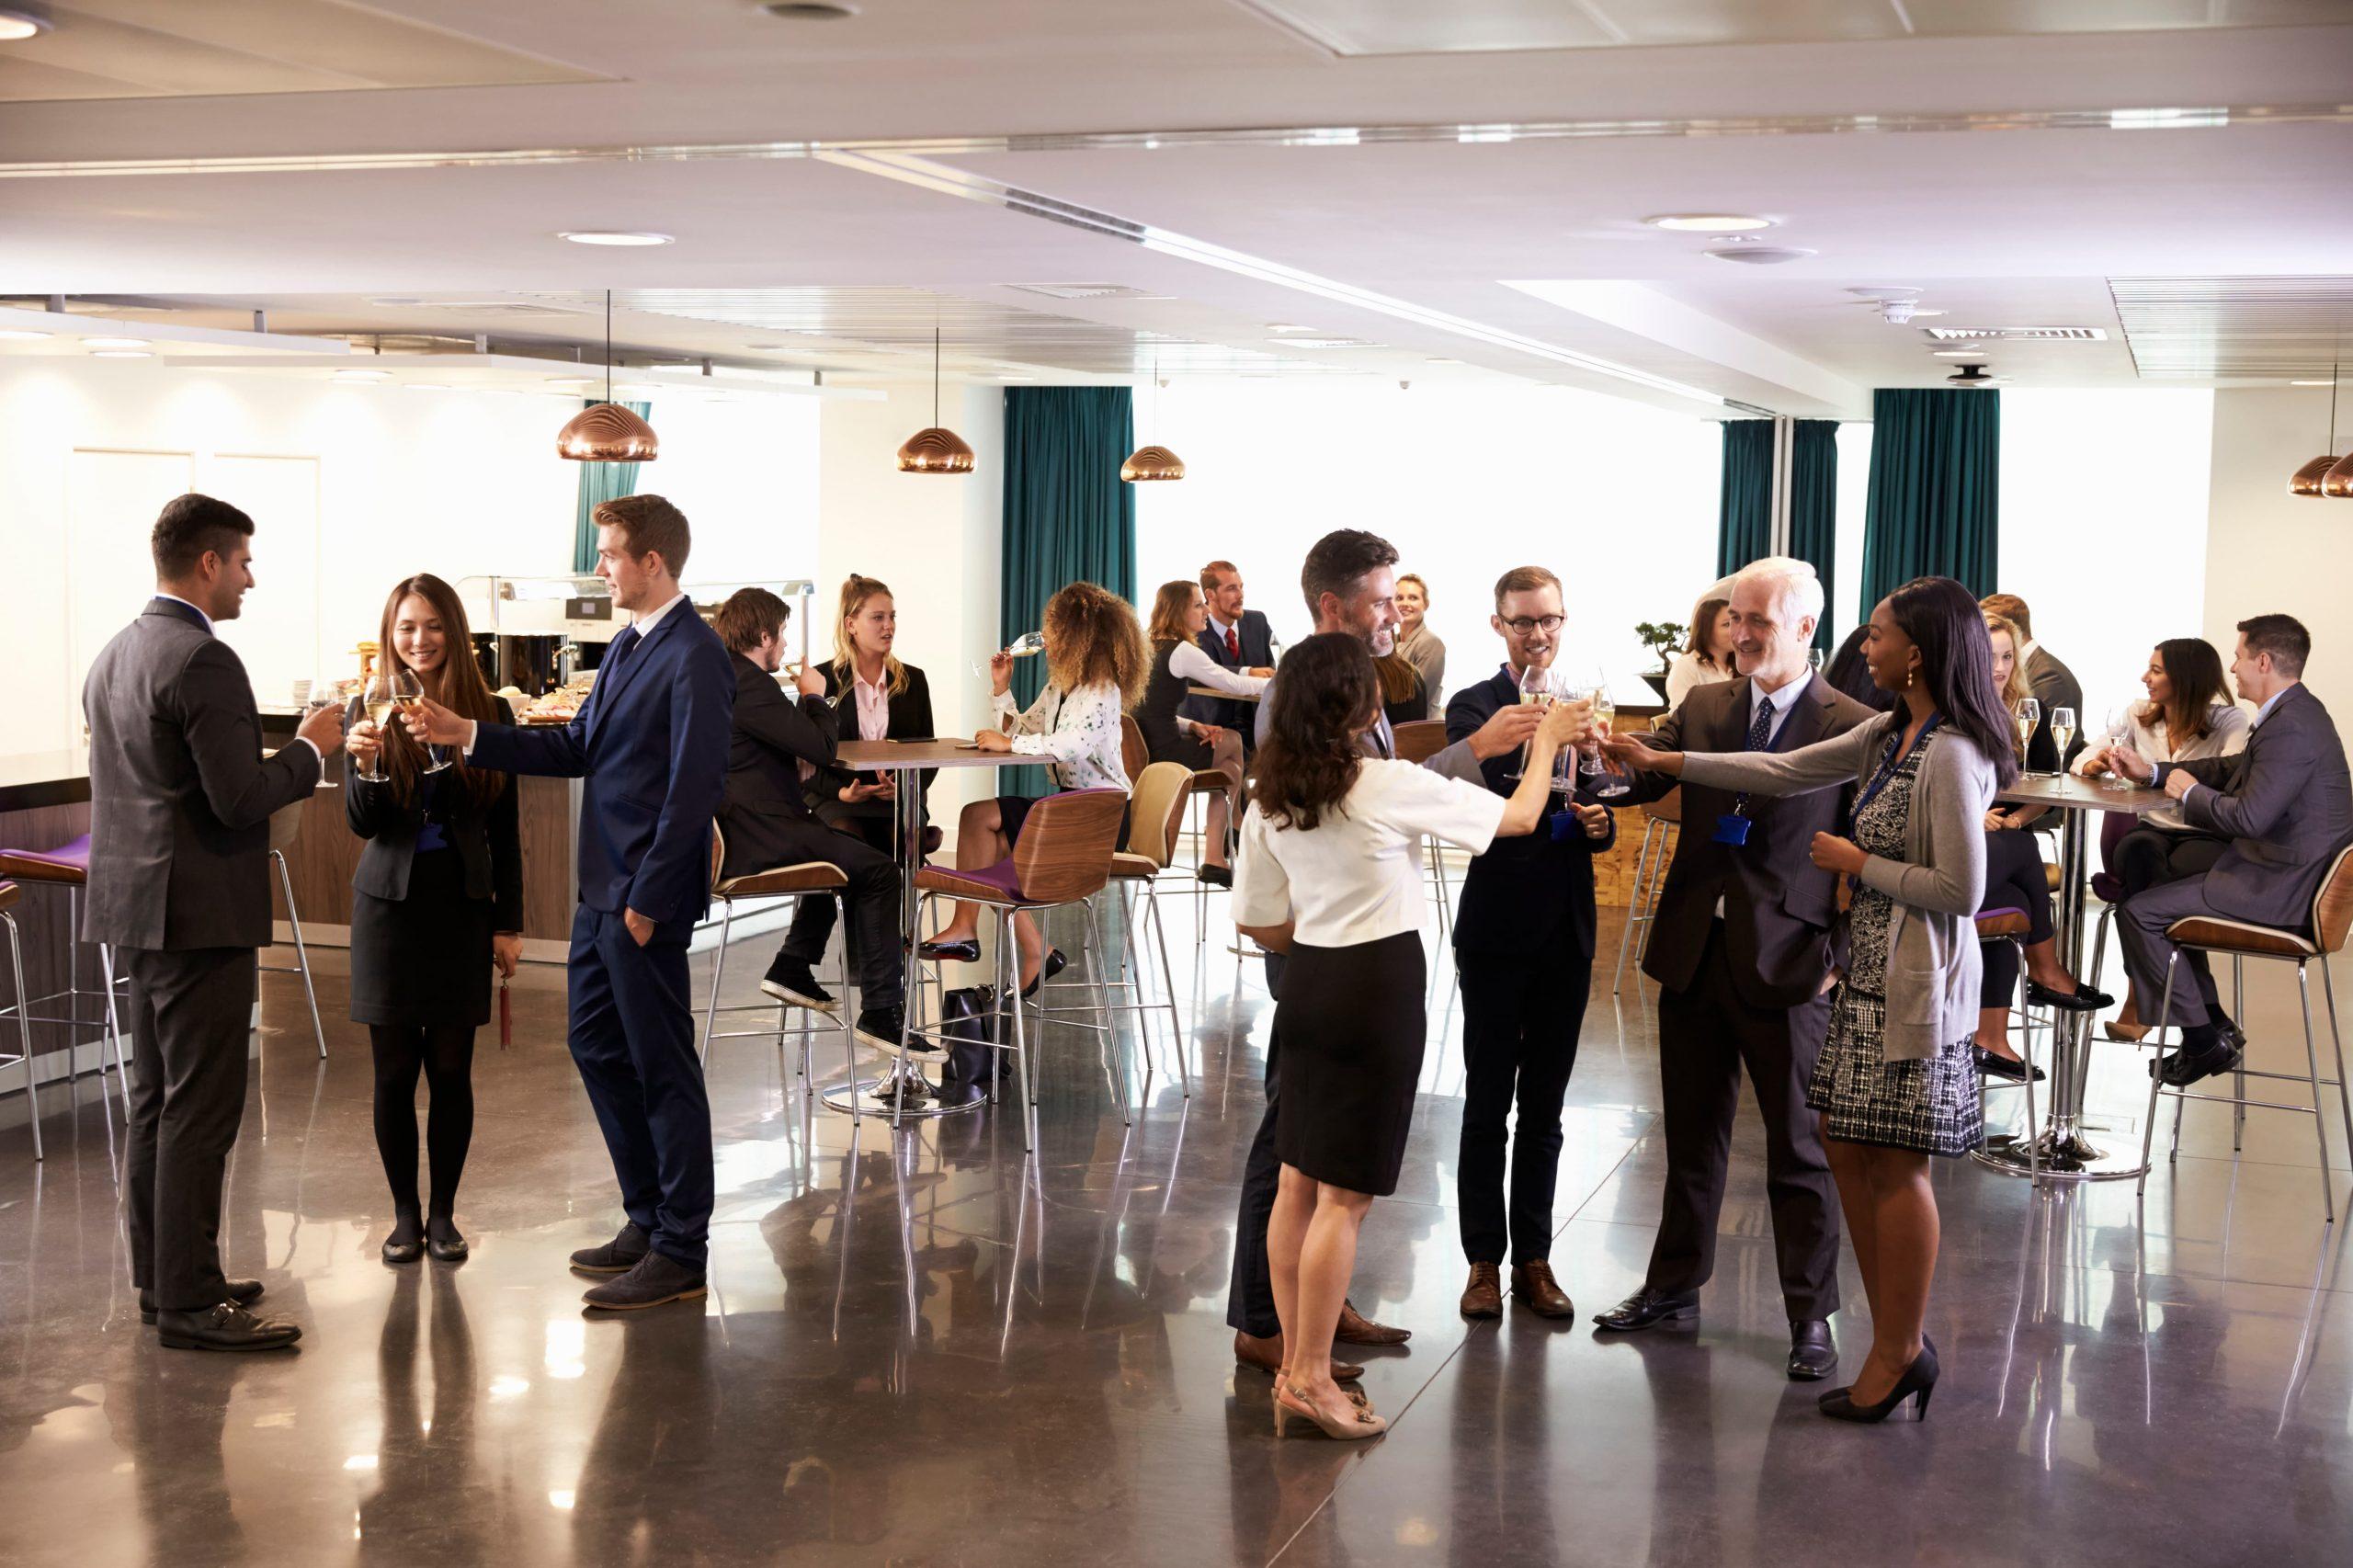 delegates-networking-at-conference-drinks-receptio-P5V59NU